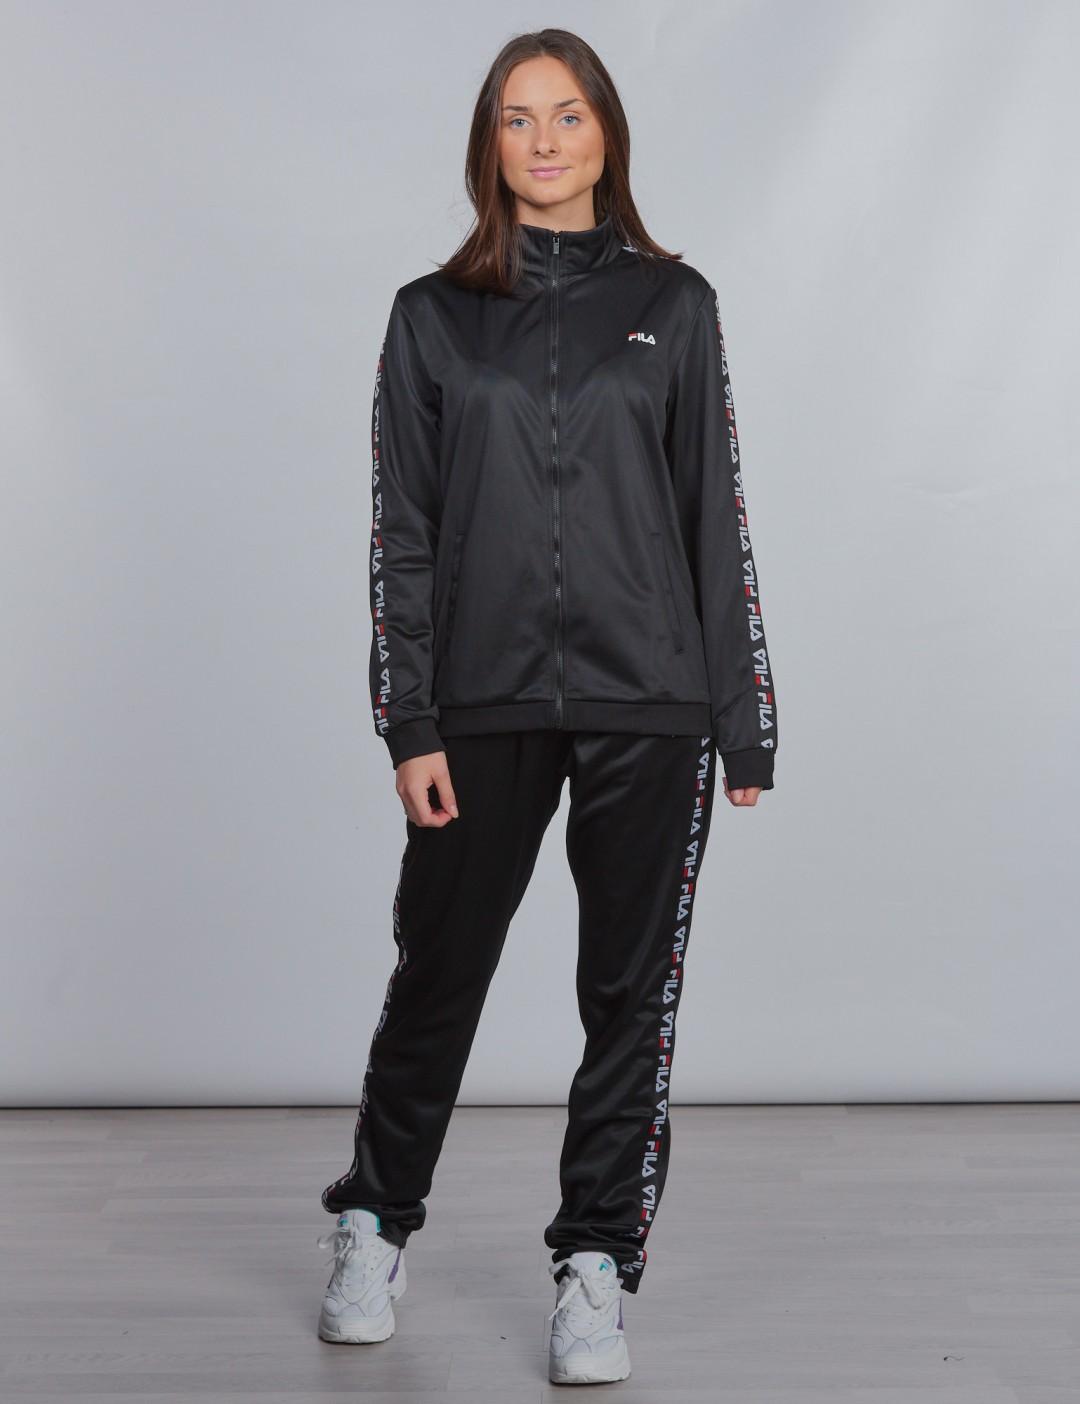 Fila TALISA track jacket